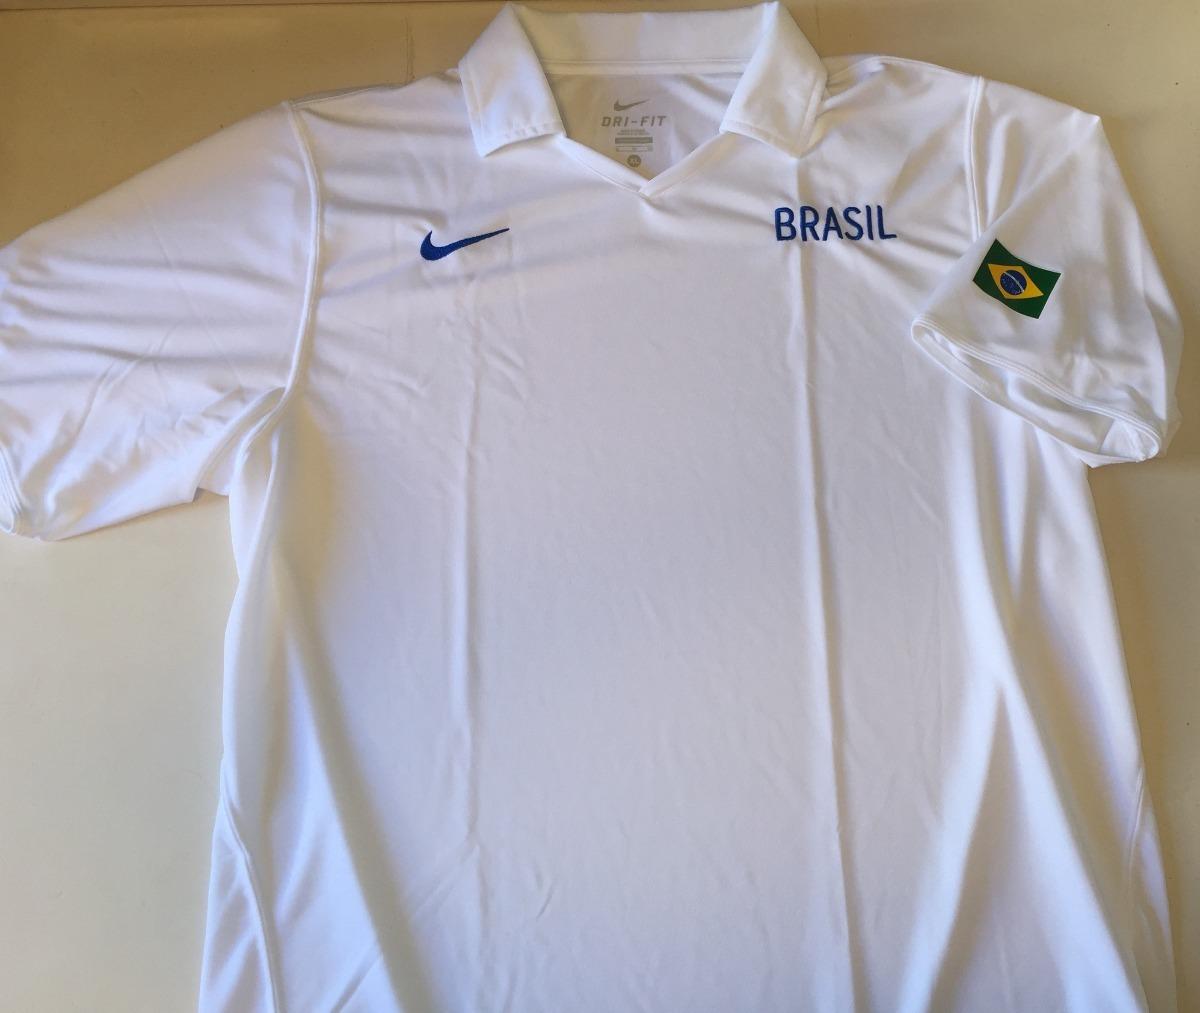 8ed139b199212 camisa polo brasil basquete - nike original! copa olimpíadas. Carregando  zoom.